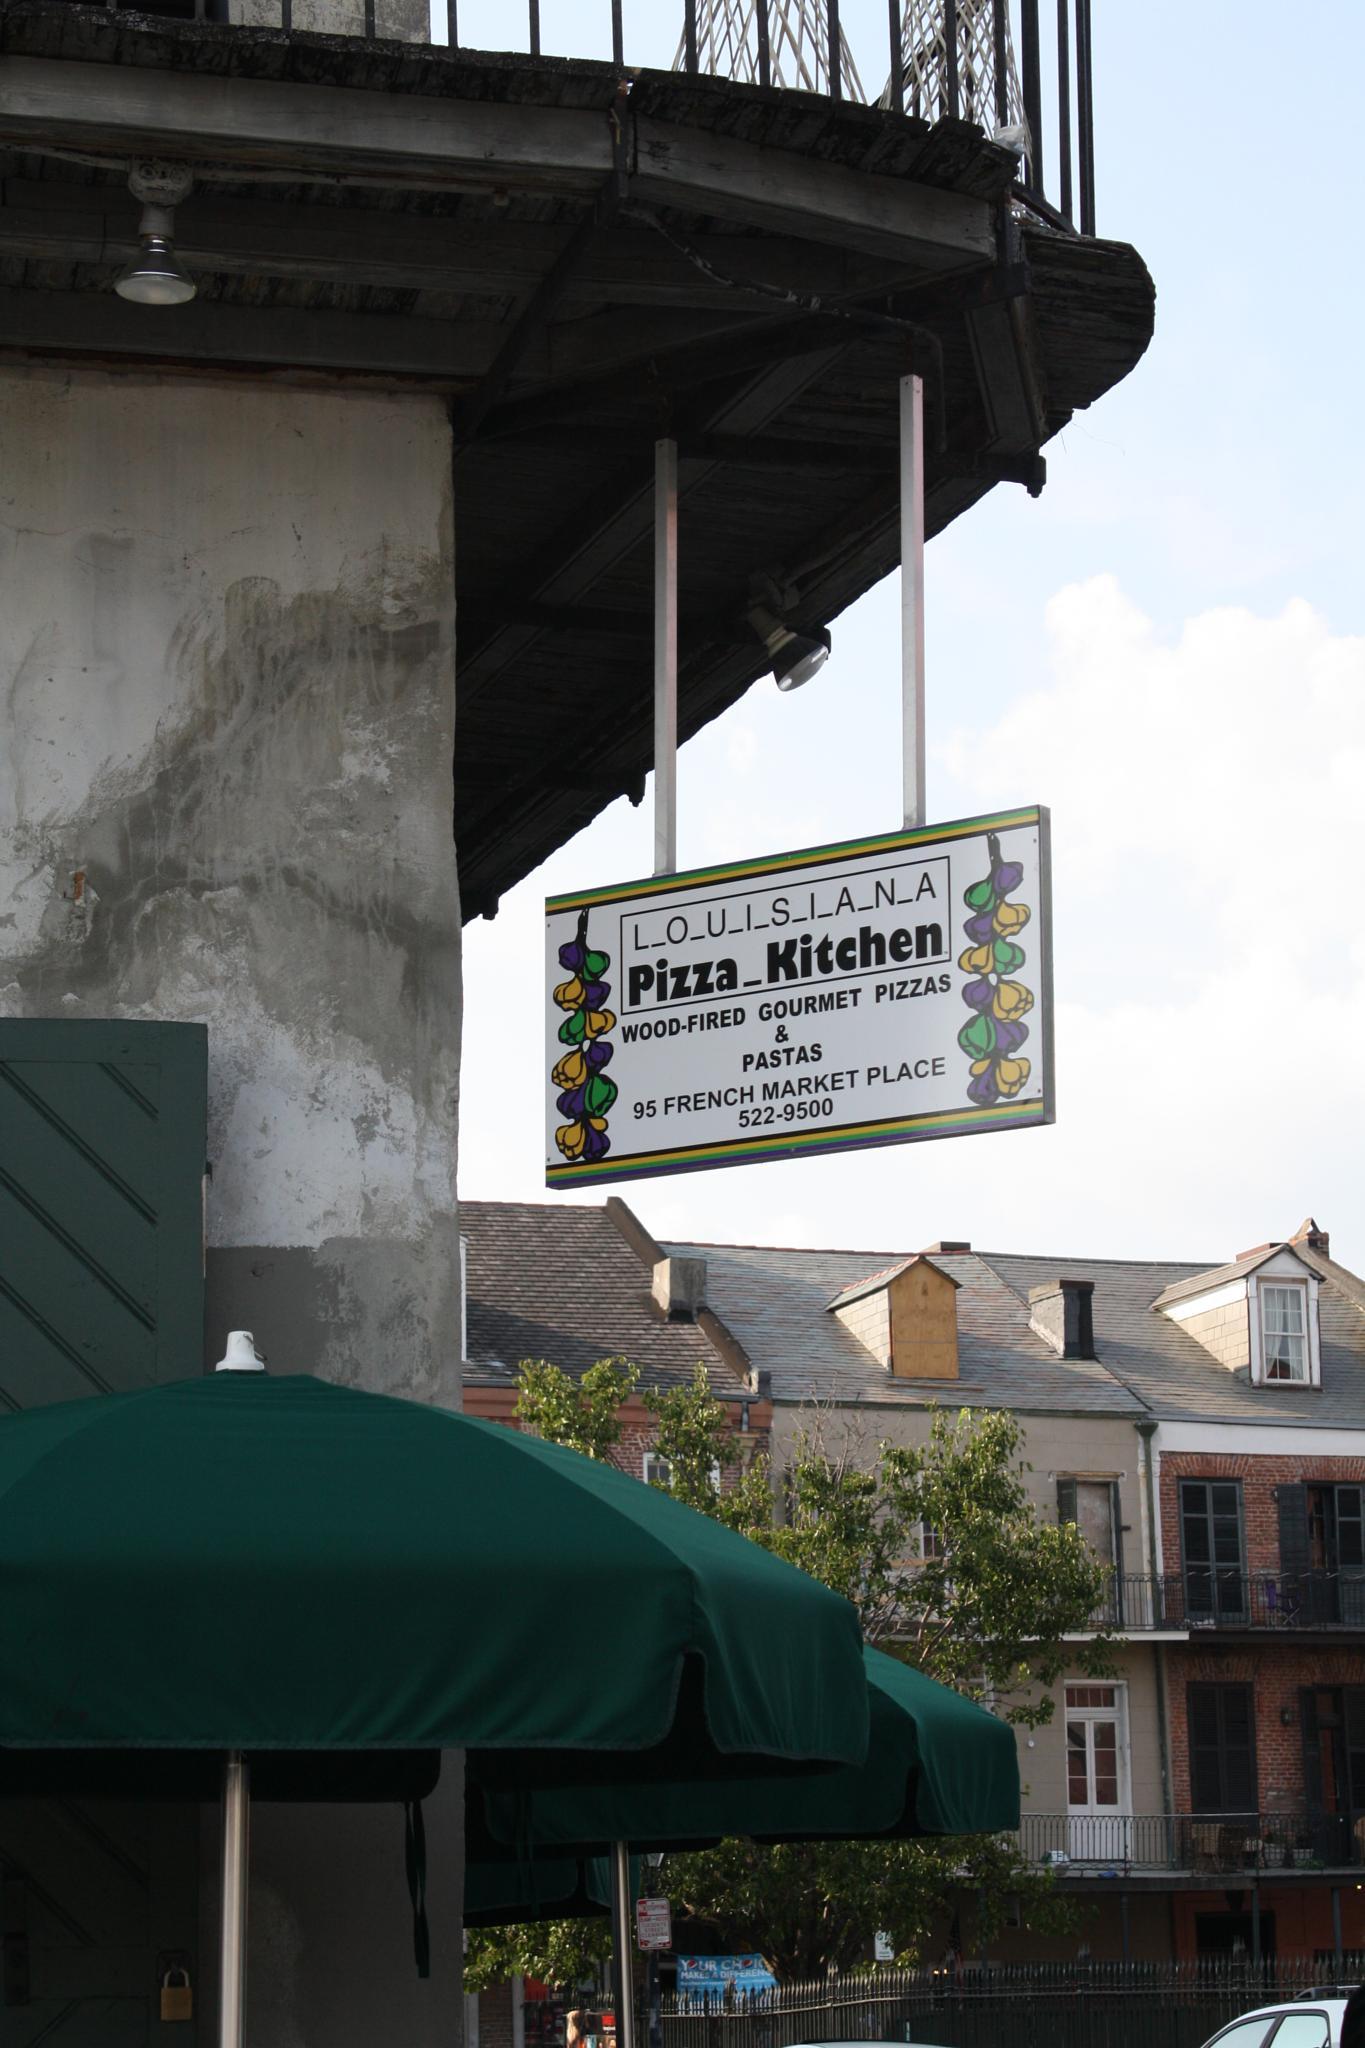 Louisiana Pizza Kitchen in New Orleans by jbakerpharmd